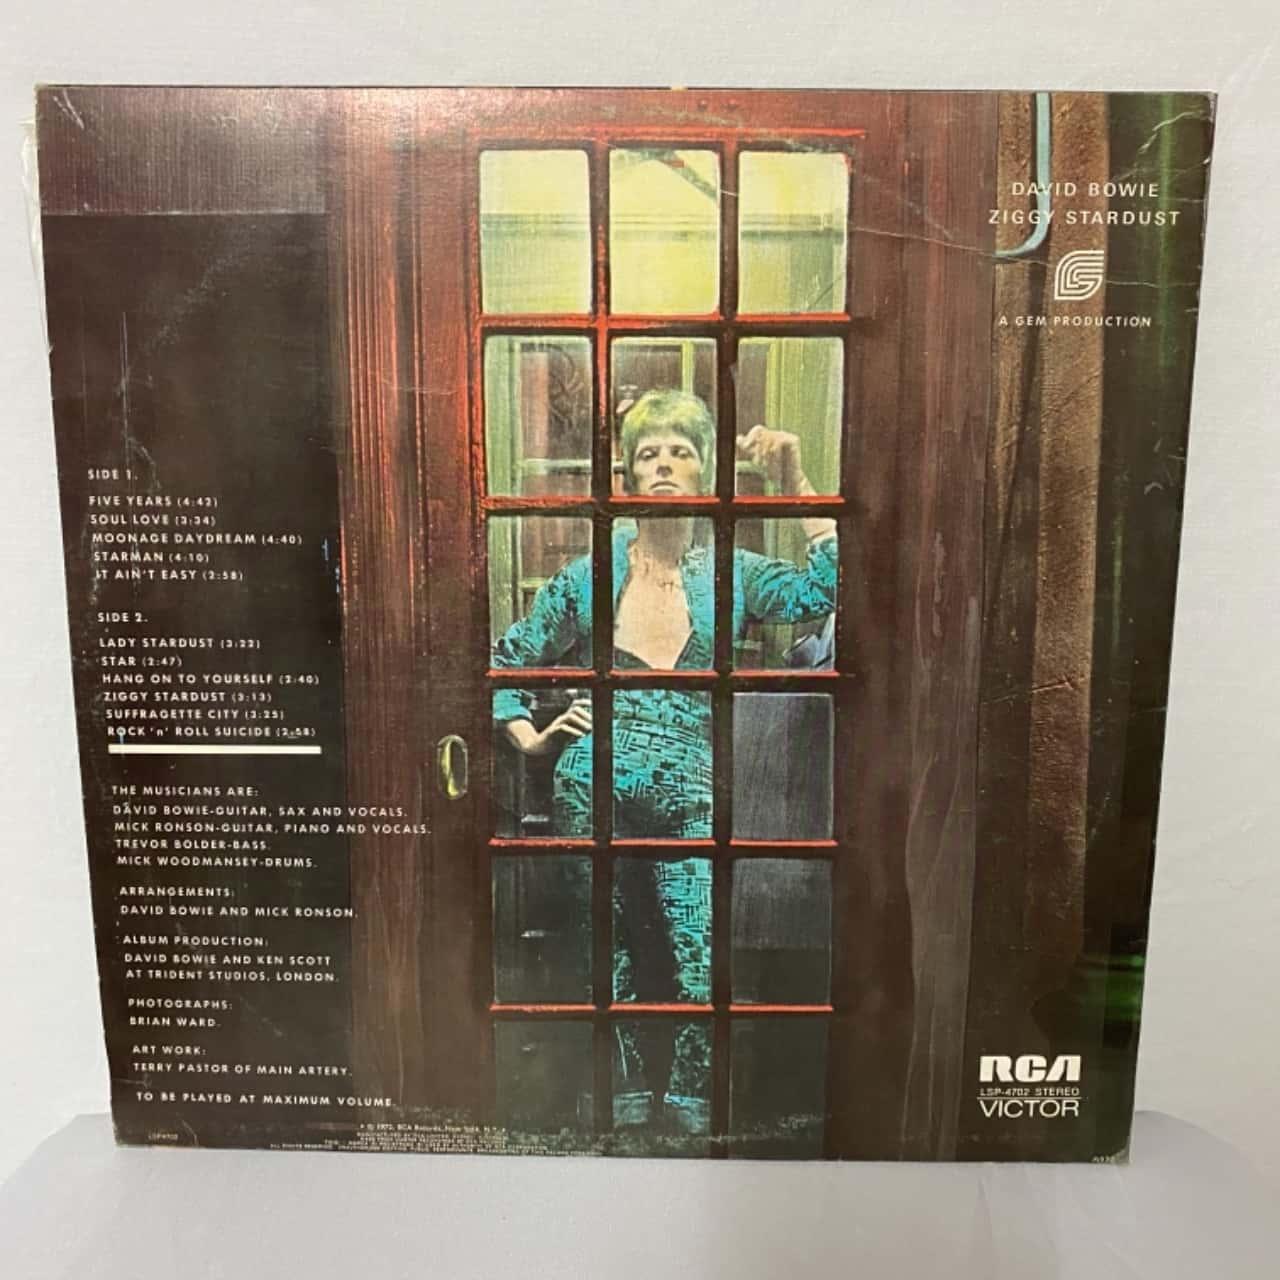 Vinyl Record David Bowie Ziggy Stardust